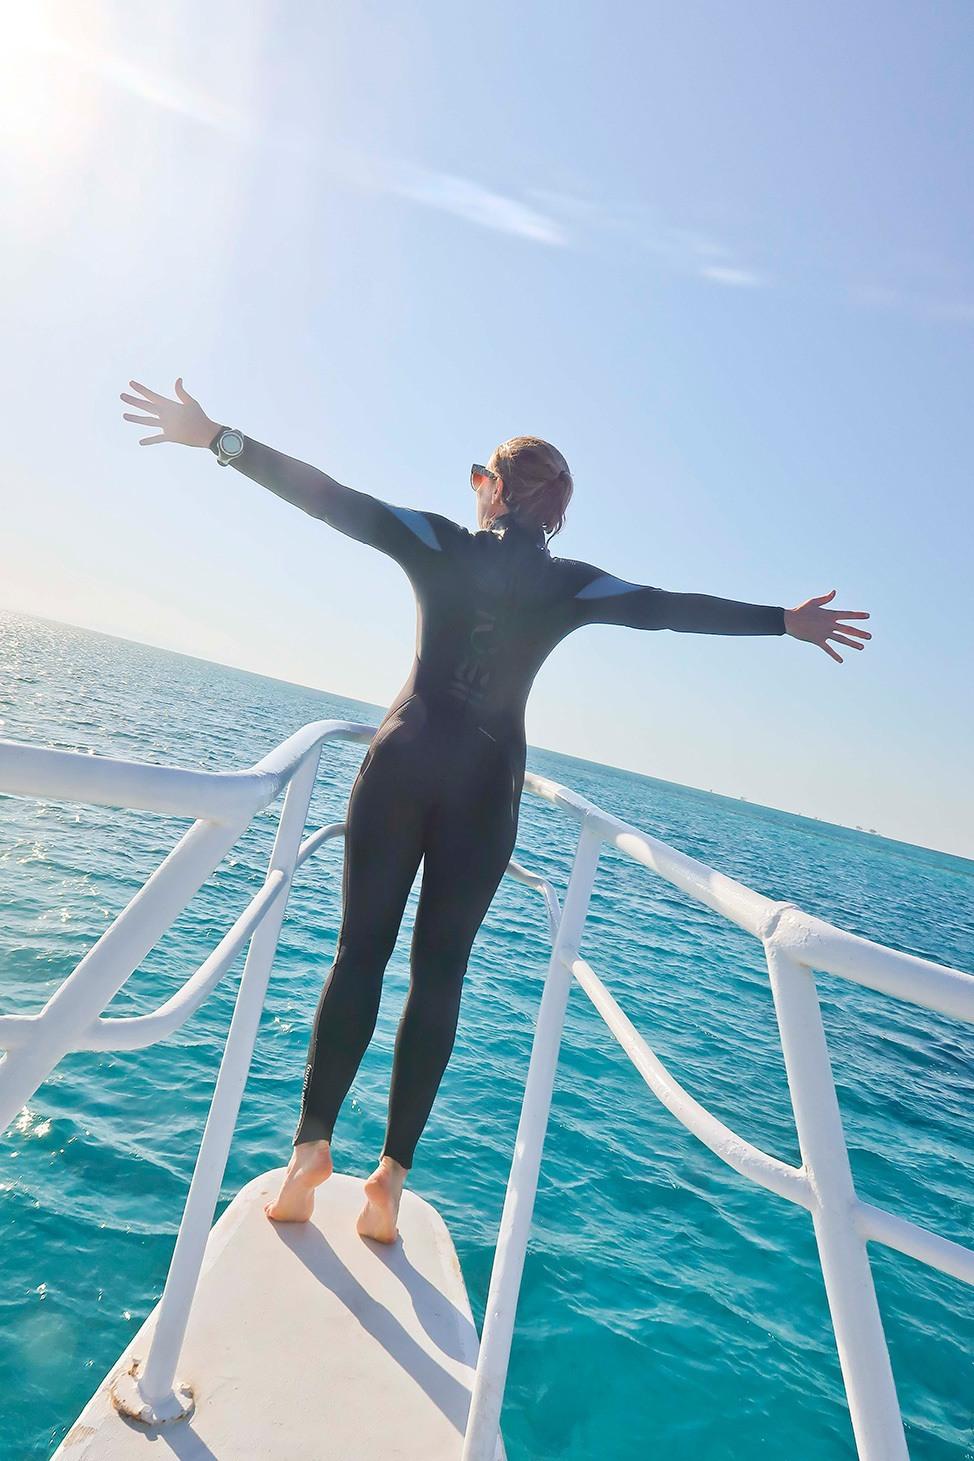 PADI Travel Liveaboard Review